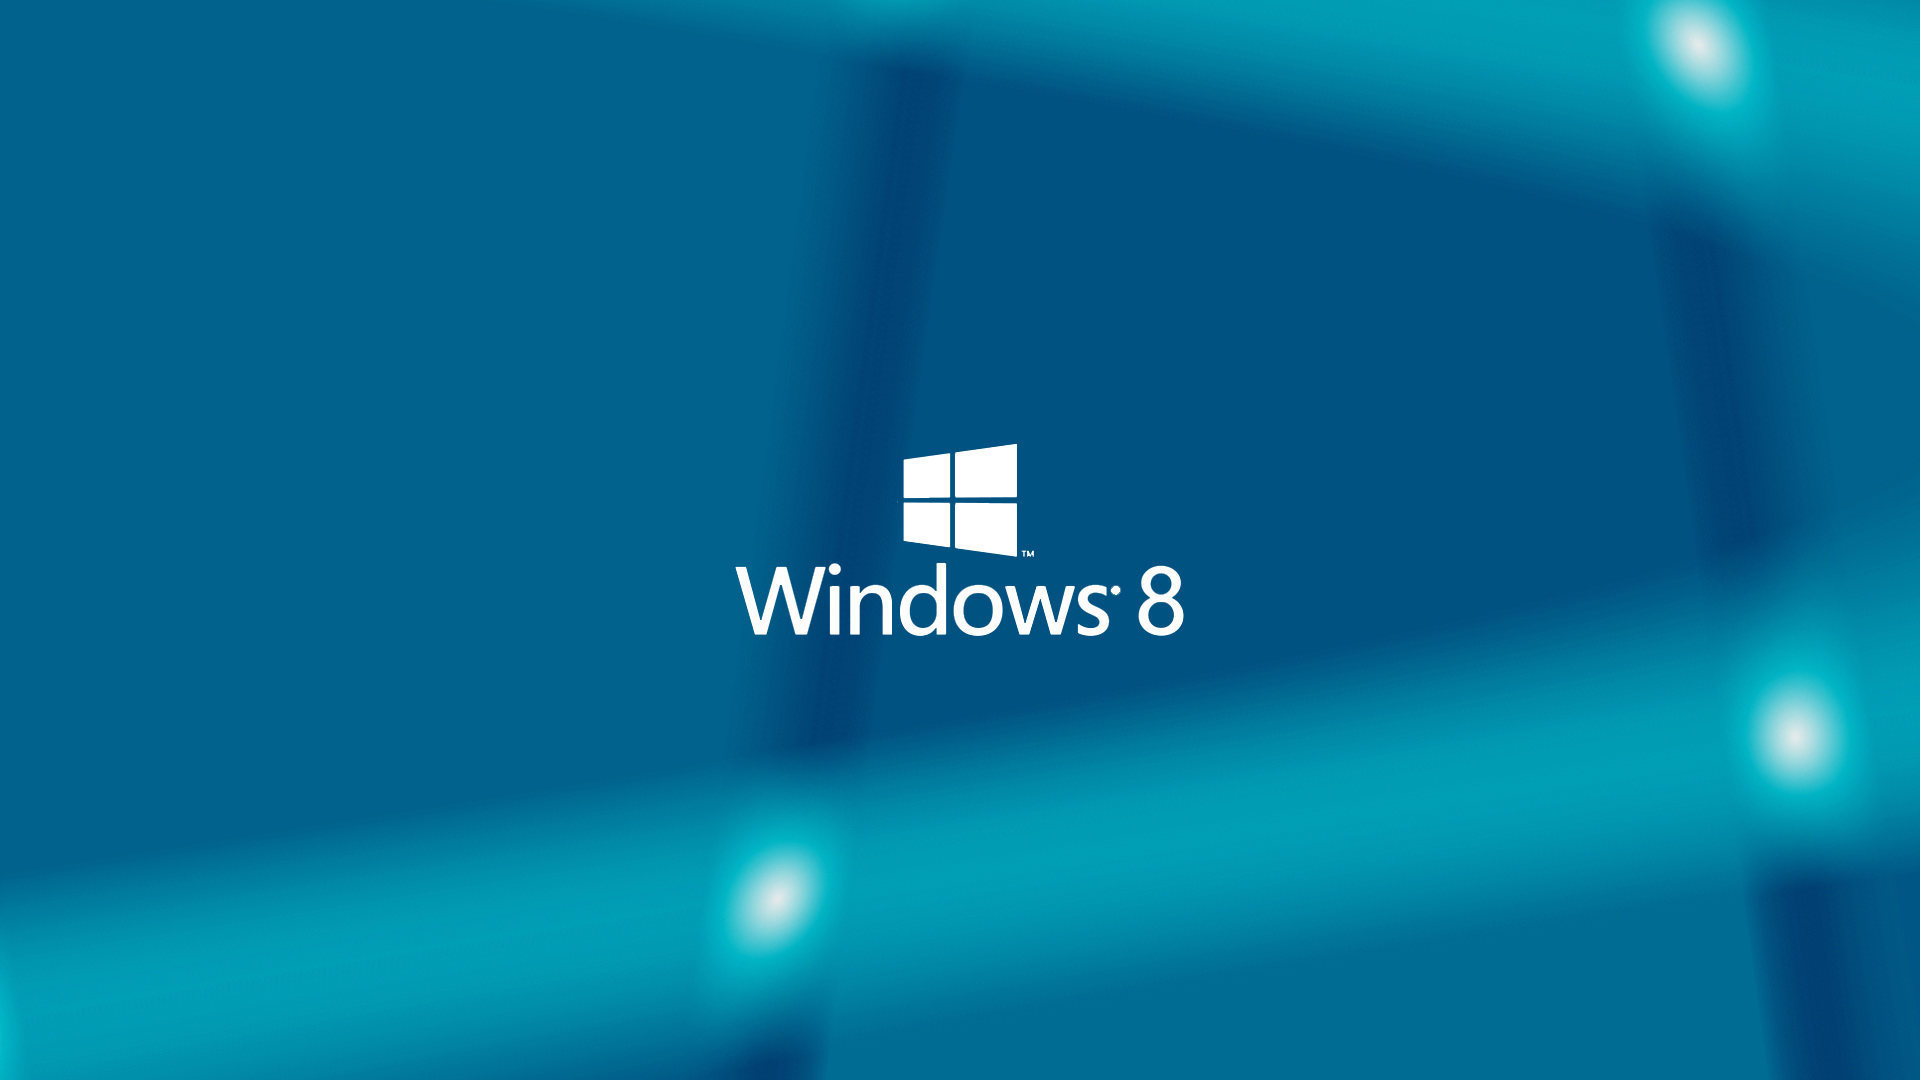 Microsoft Desktop Backgrounds 1080p 1920x1080